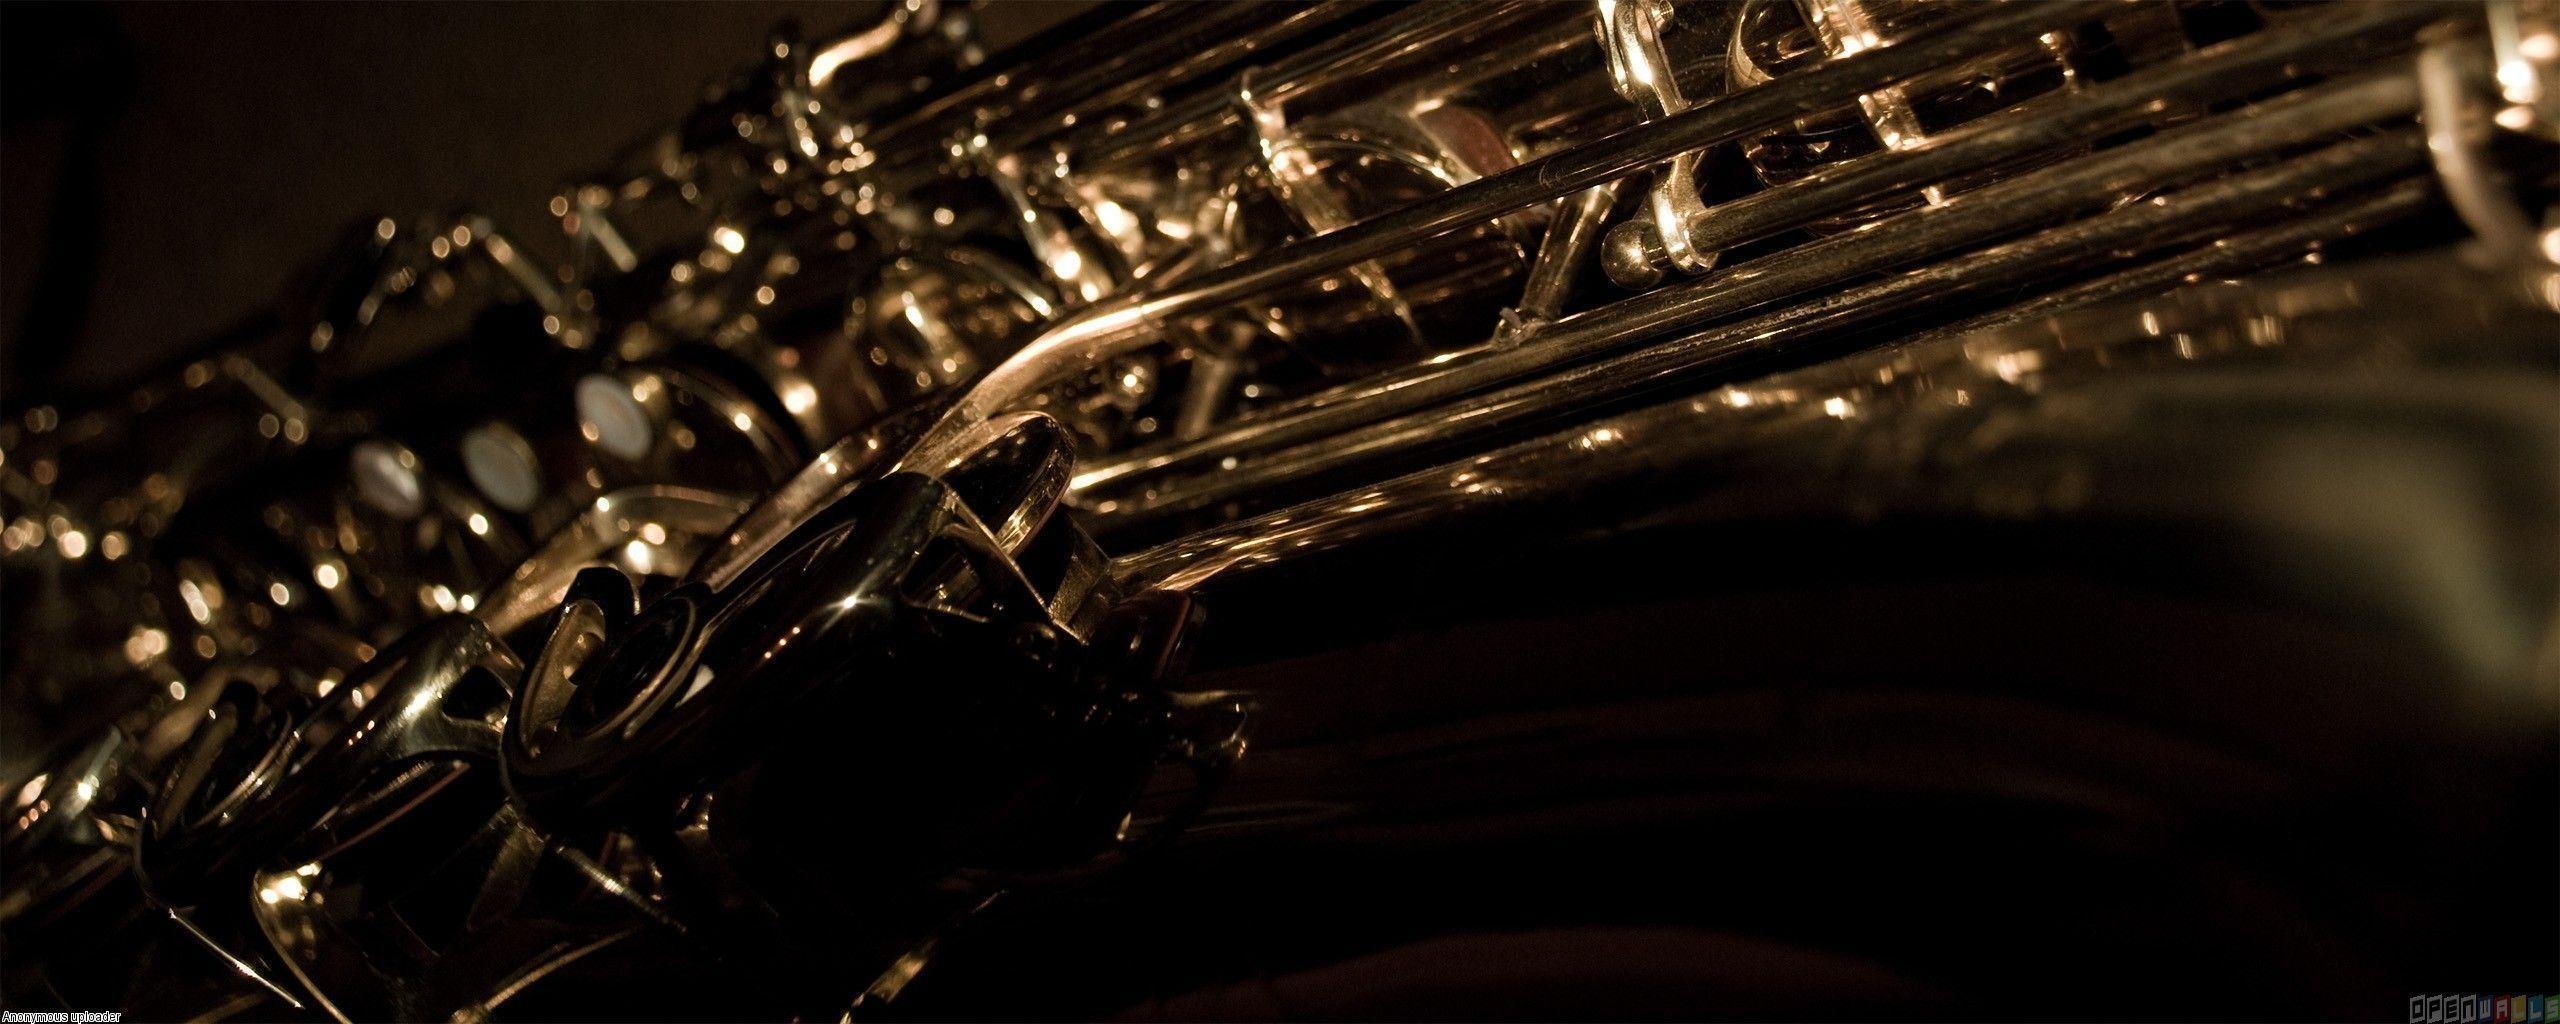 Saxophone Wallpaper Wallpaper Full HD